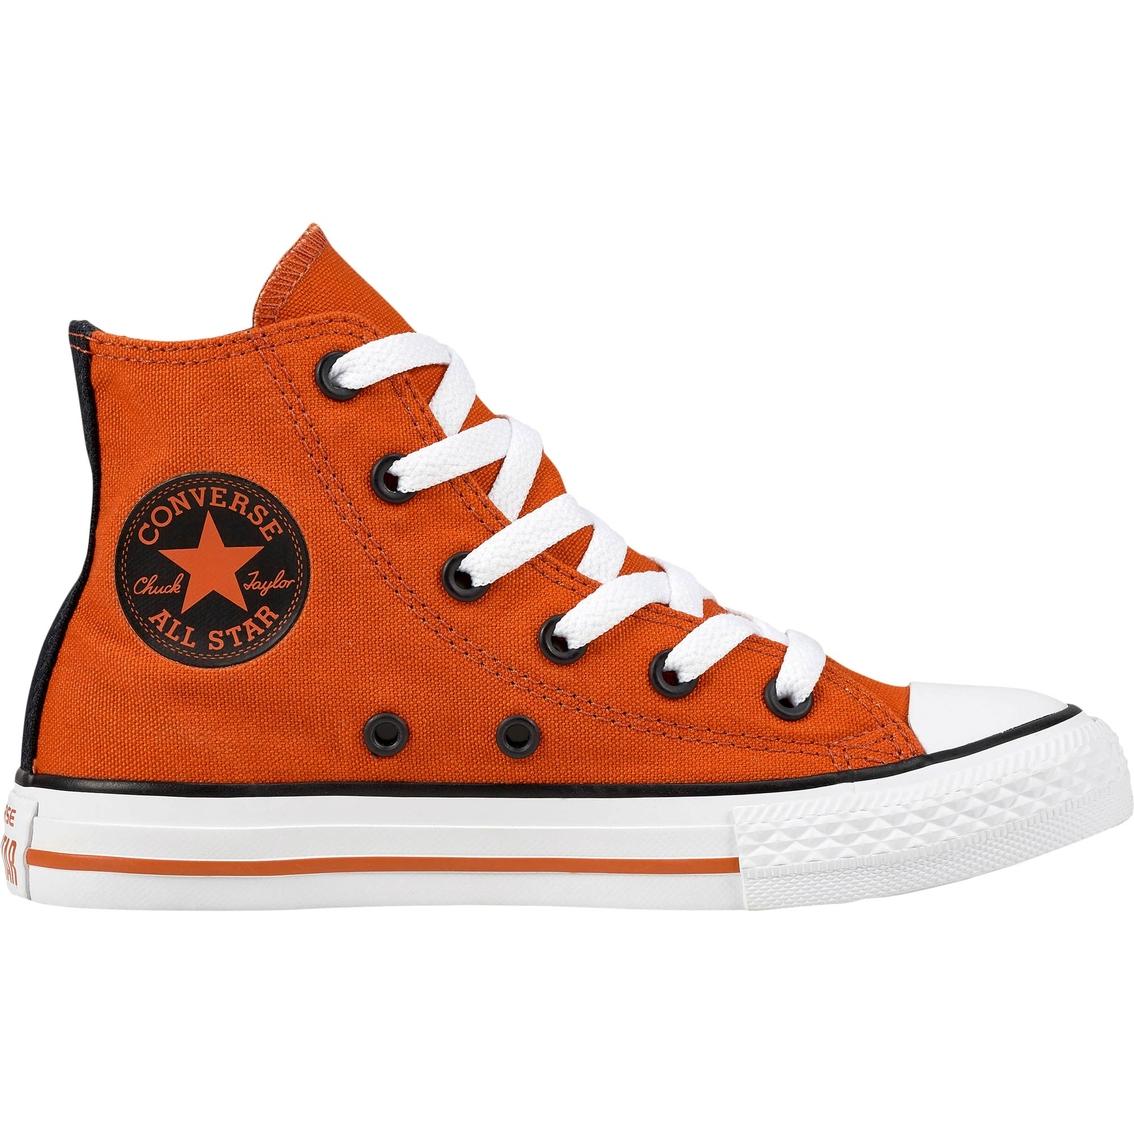 f549e01a0ad3 Converse Grade School Boys Chuck Taylor All Star High Top Sneakers ...